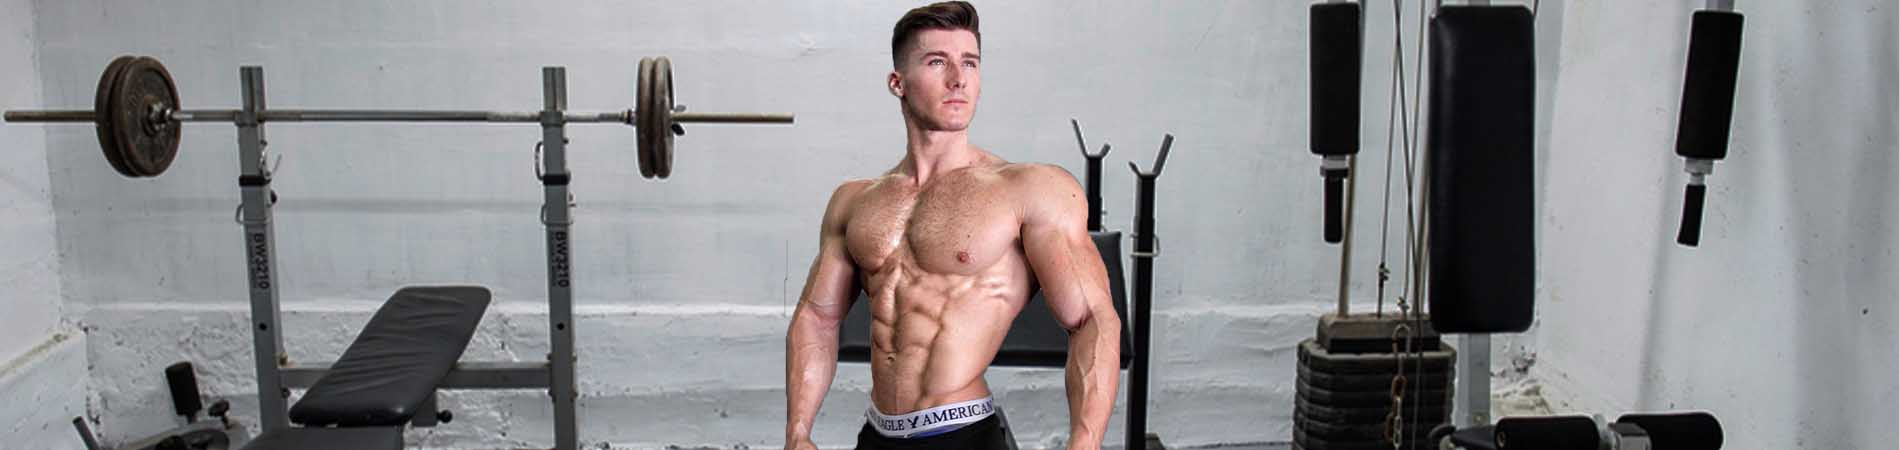 bodybuilding back Changes: 5 Actionable Tips